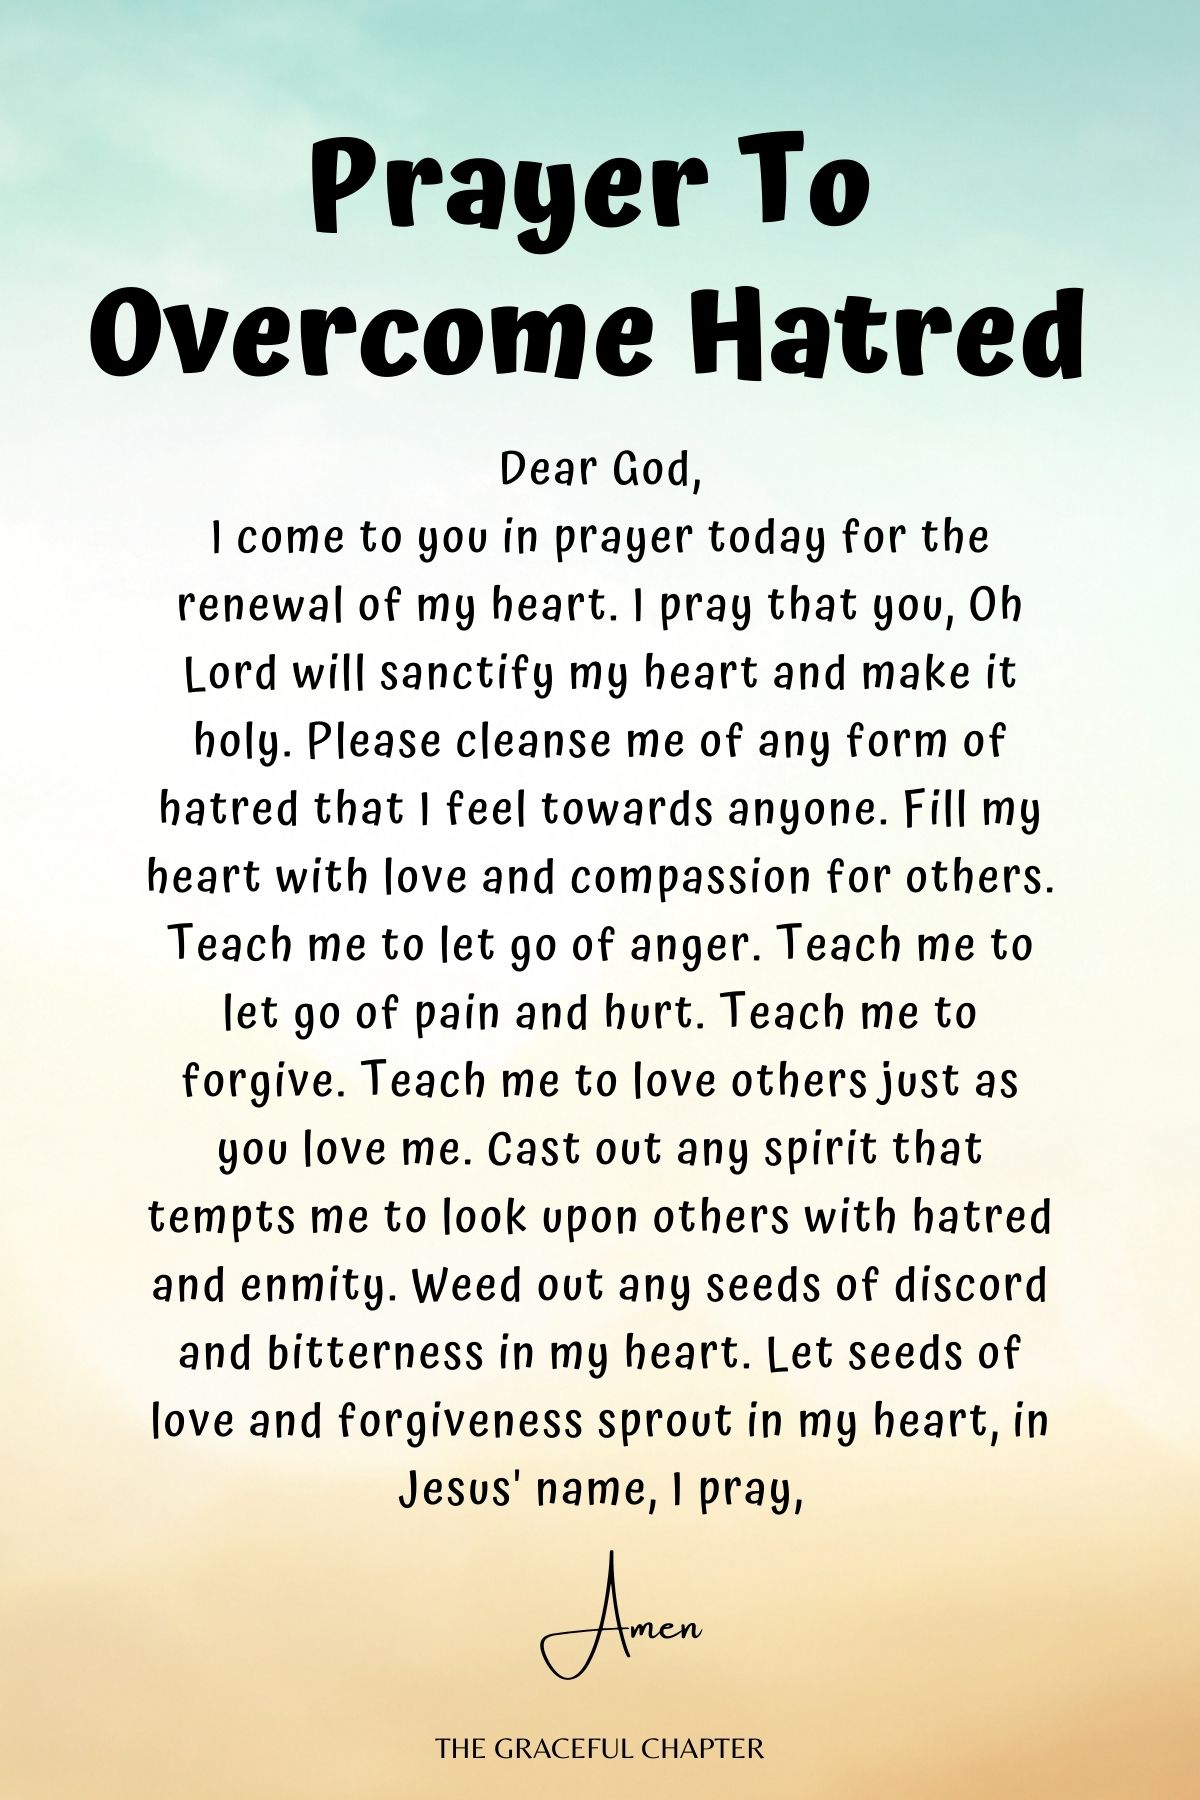 Prayer to overcome hatred